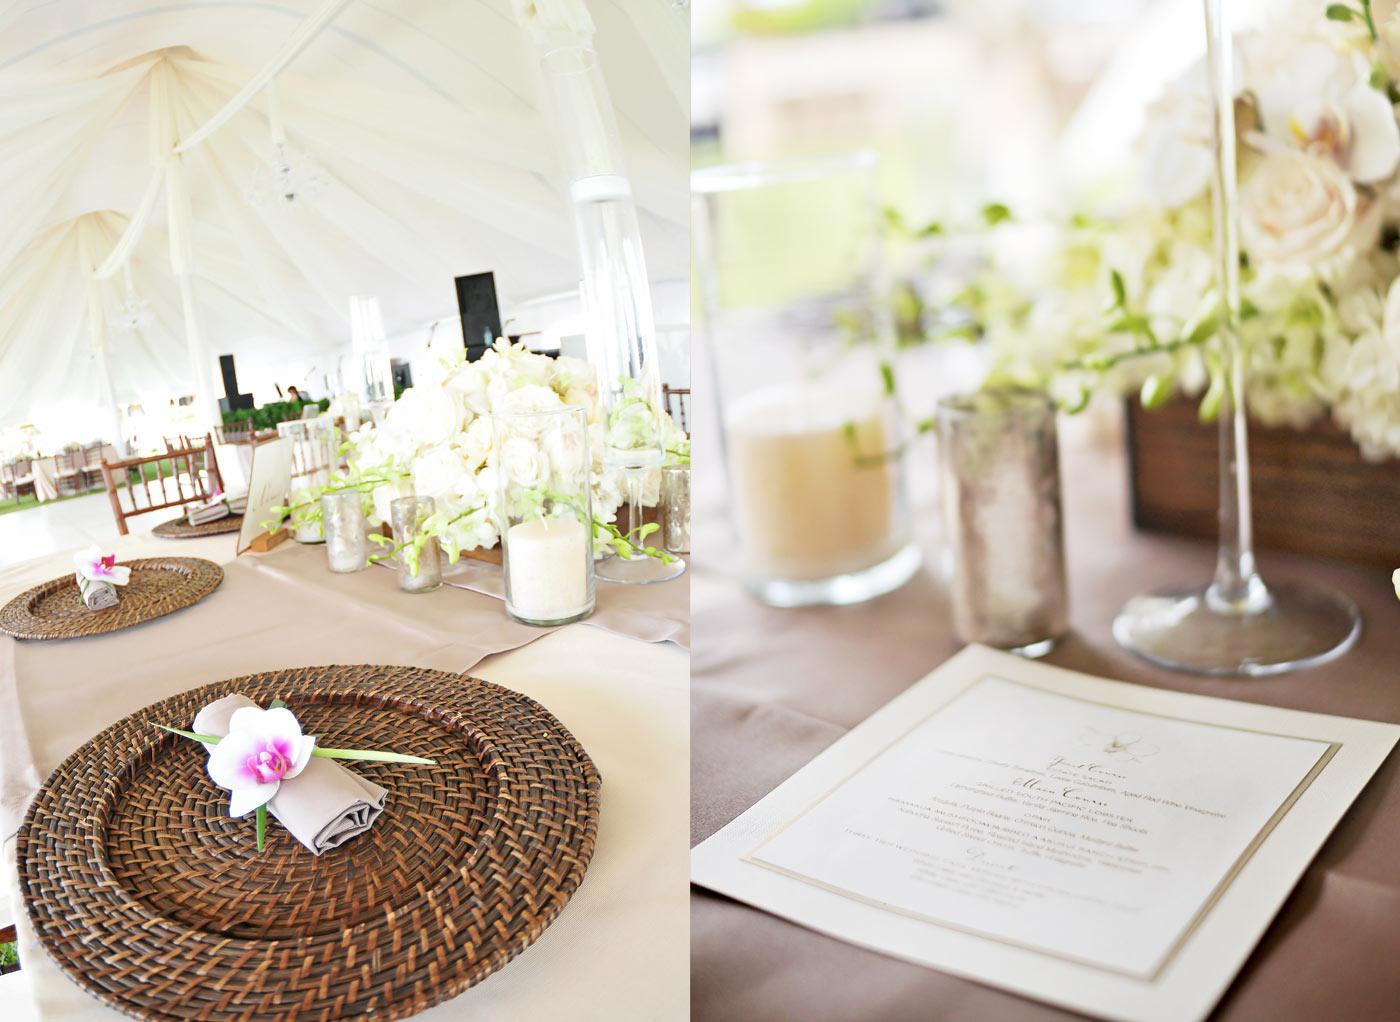 Kauai-wedding-photo-115.jpg